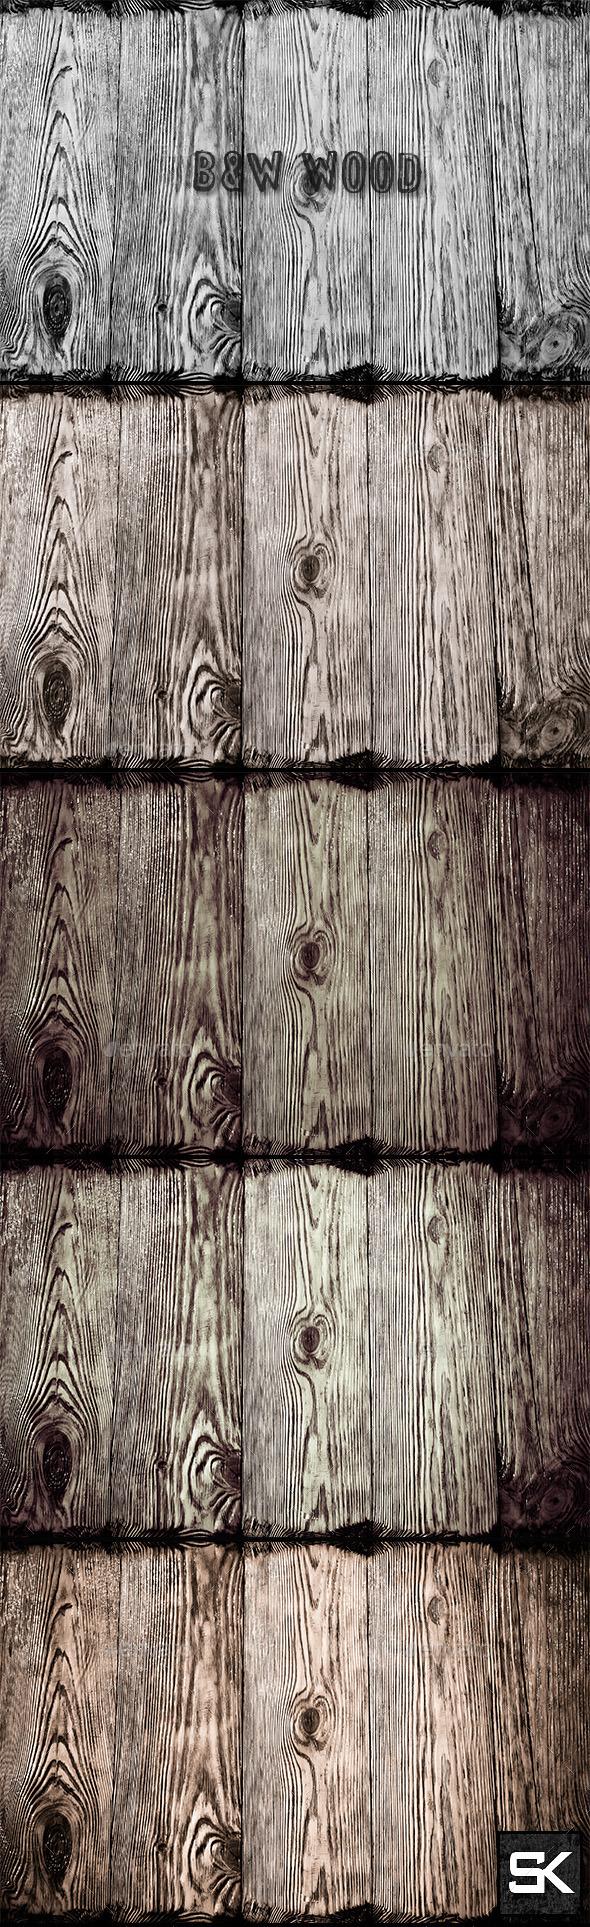 B&W Wood 2 - Wood Textures